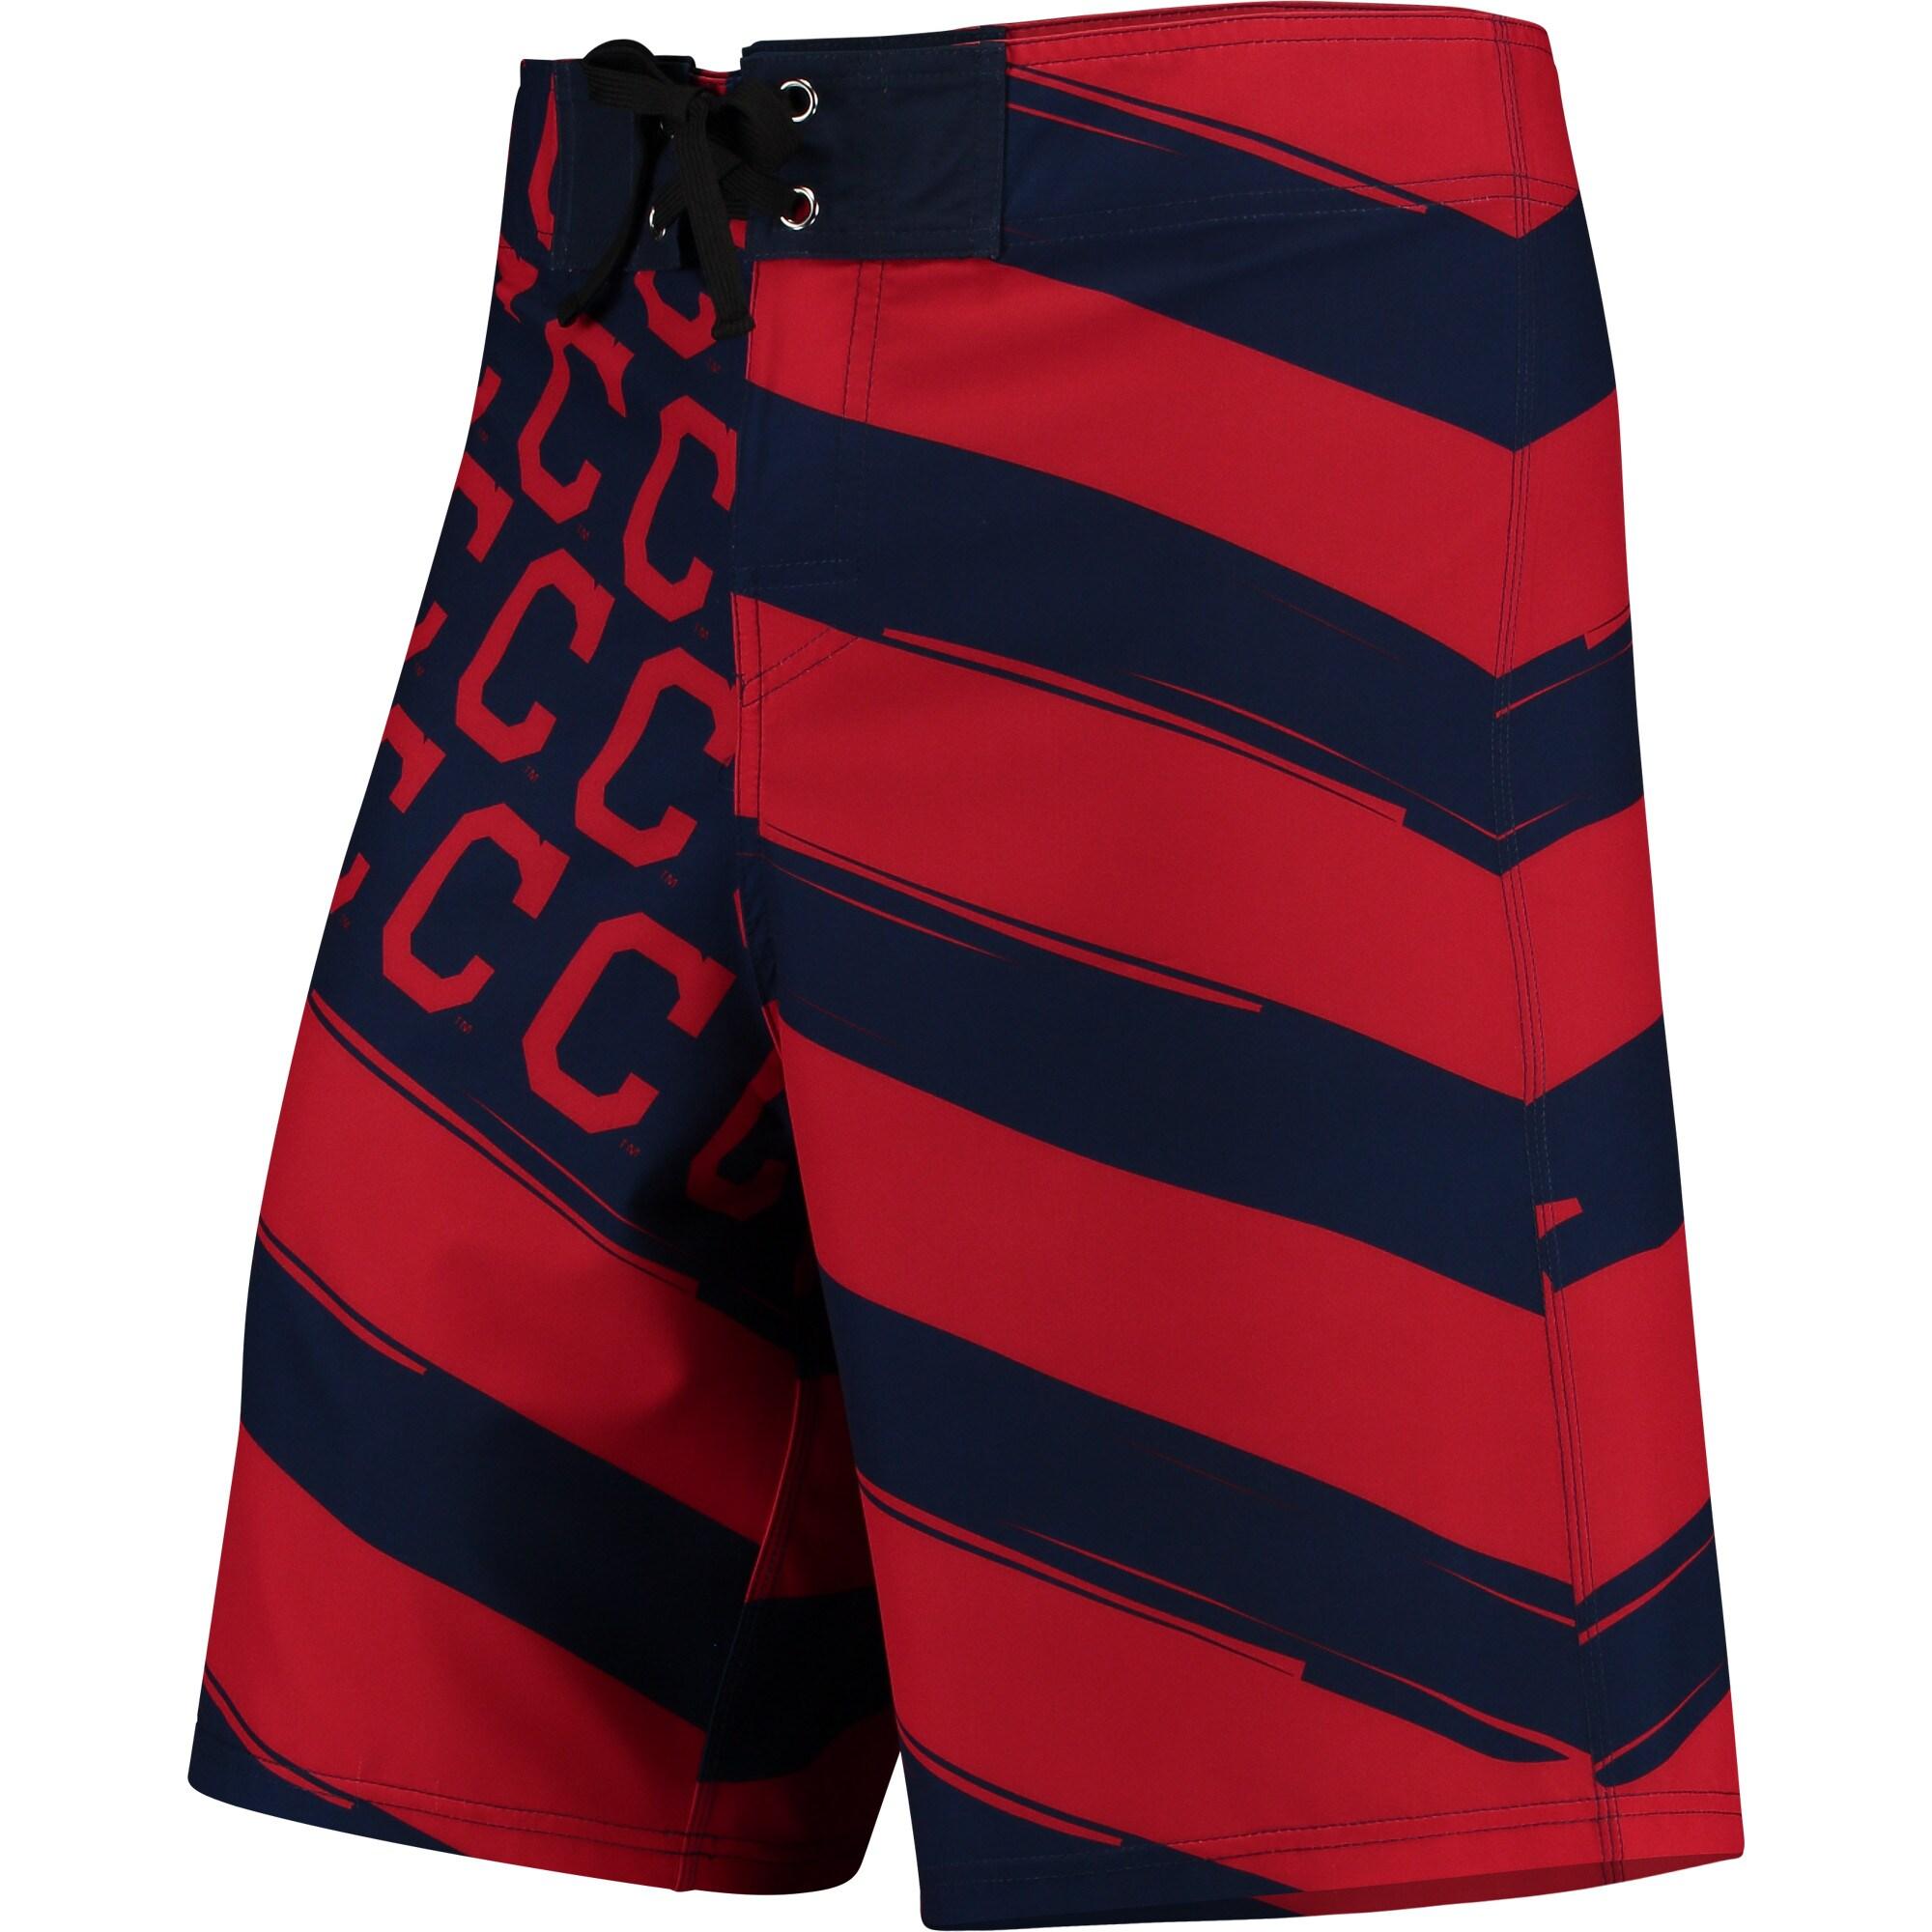 Cleveland Indians Diagonal Flag Boardshorts - Navy/Red